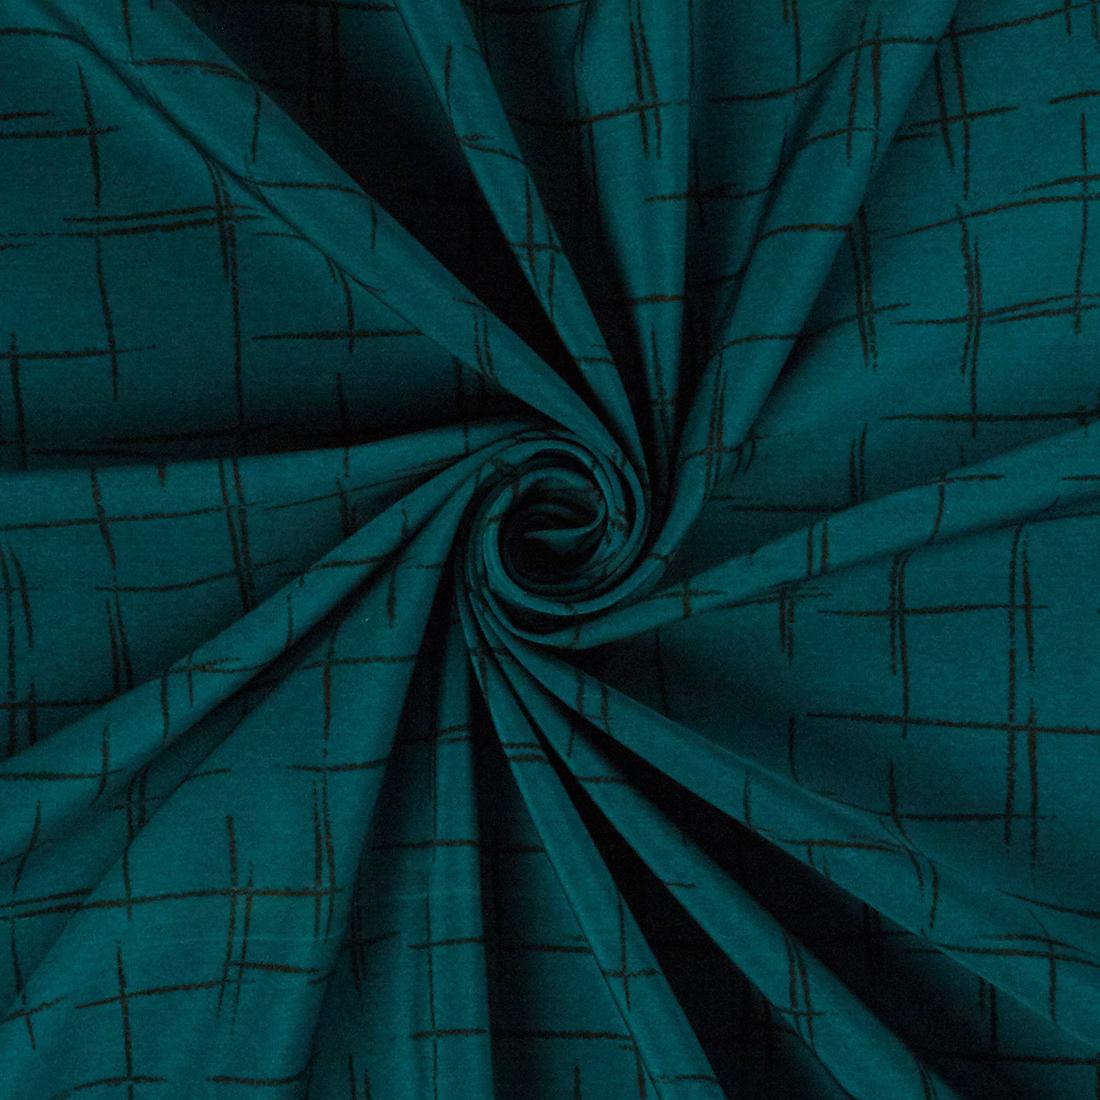 Linear Crepe Teal Dress Fabric